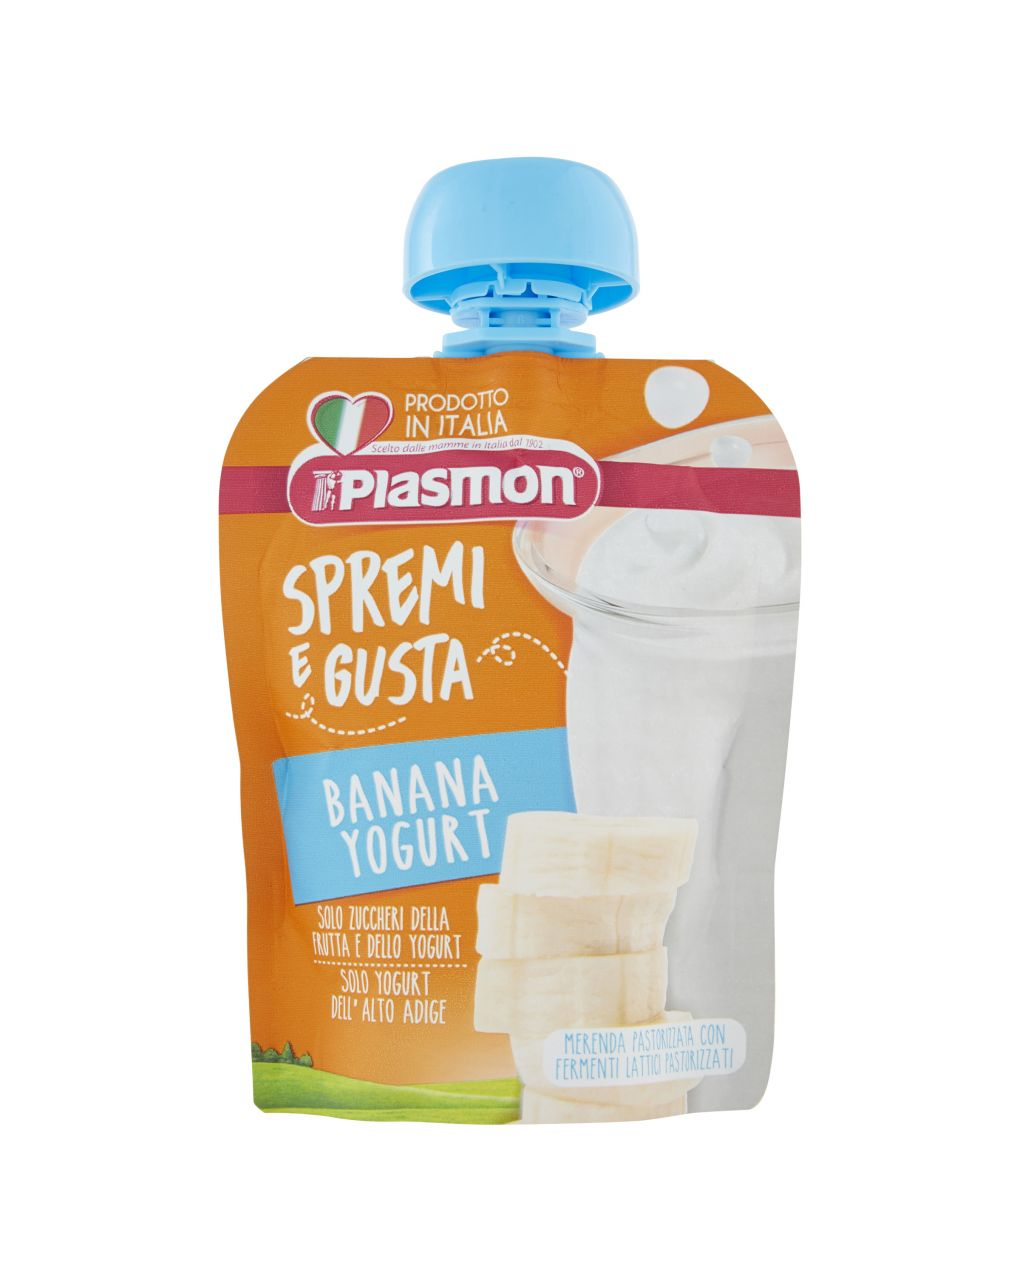 Plasmon - spremi e gusta dessert banana e yogurt 85g - Plasmon